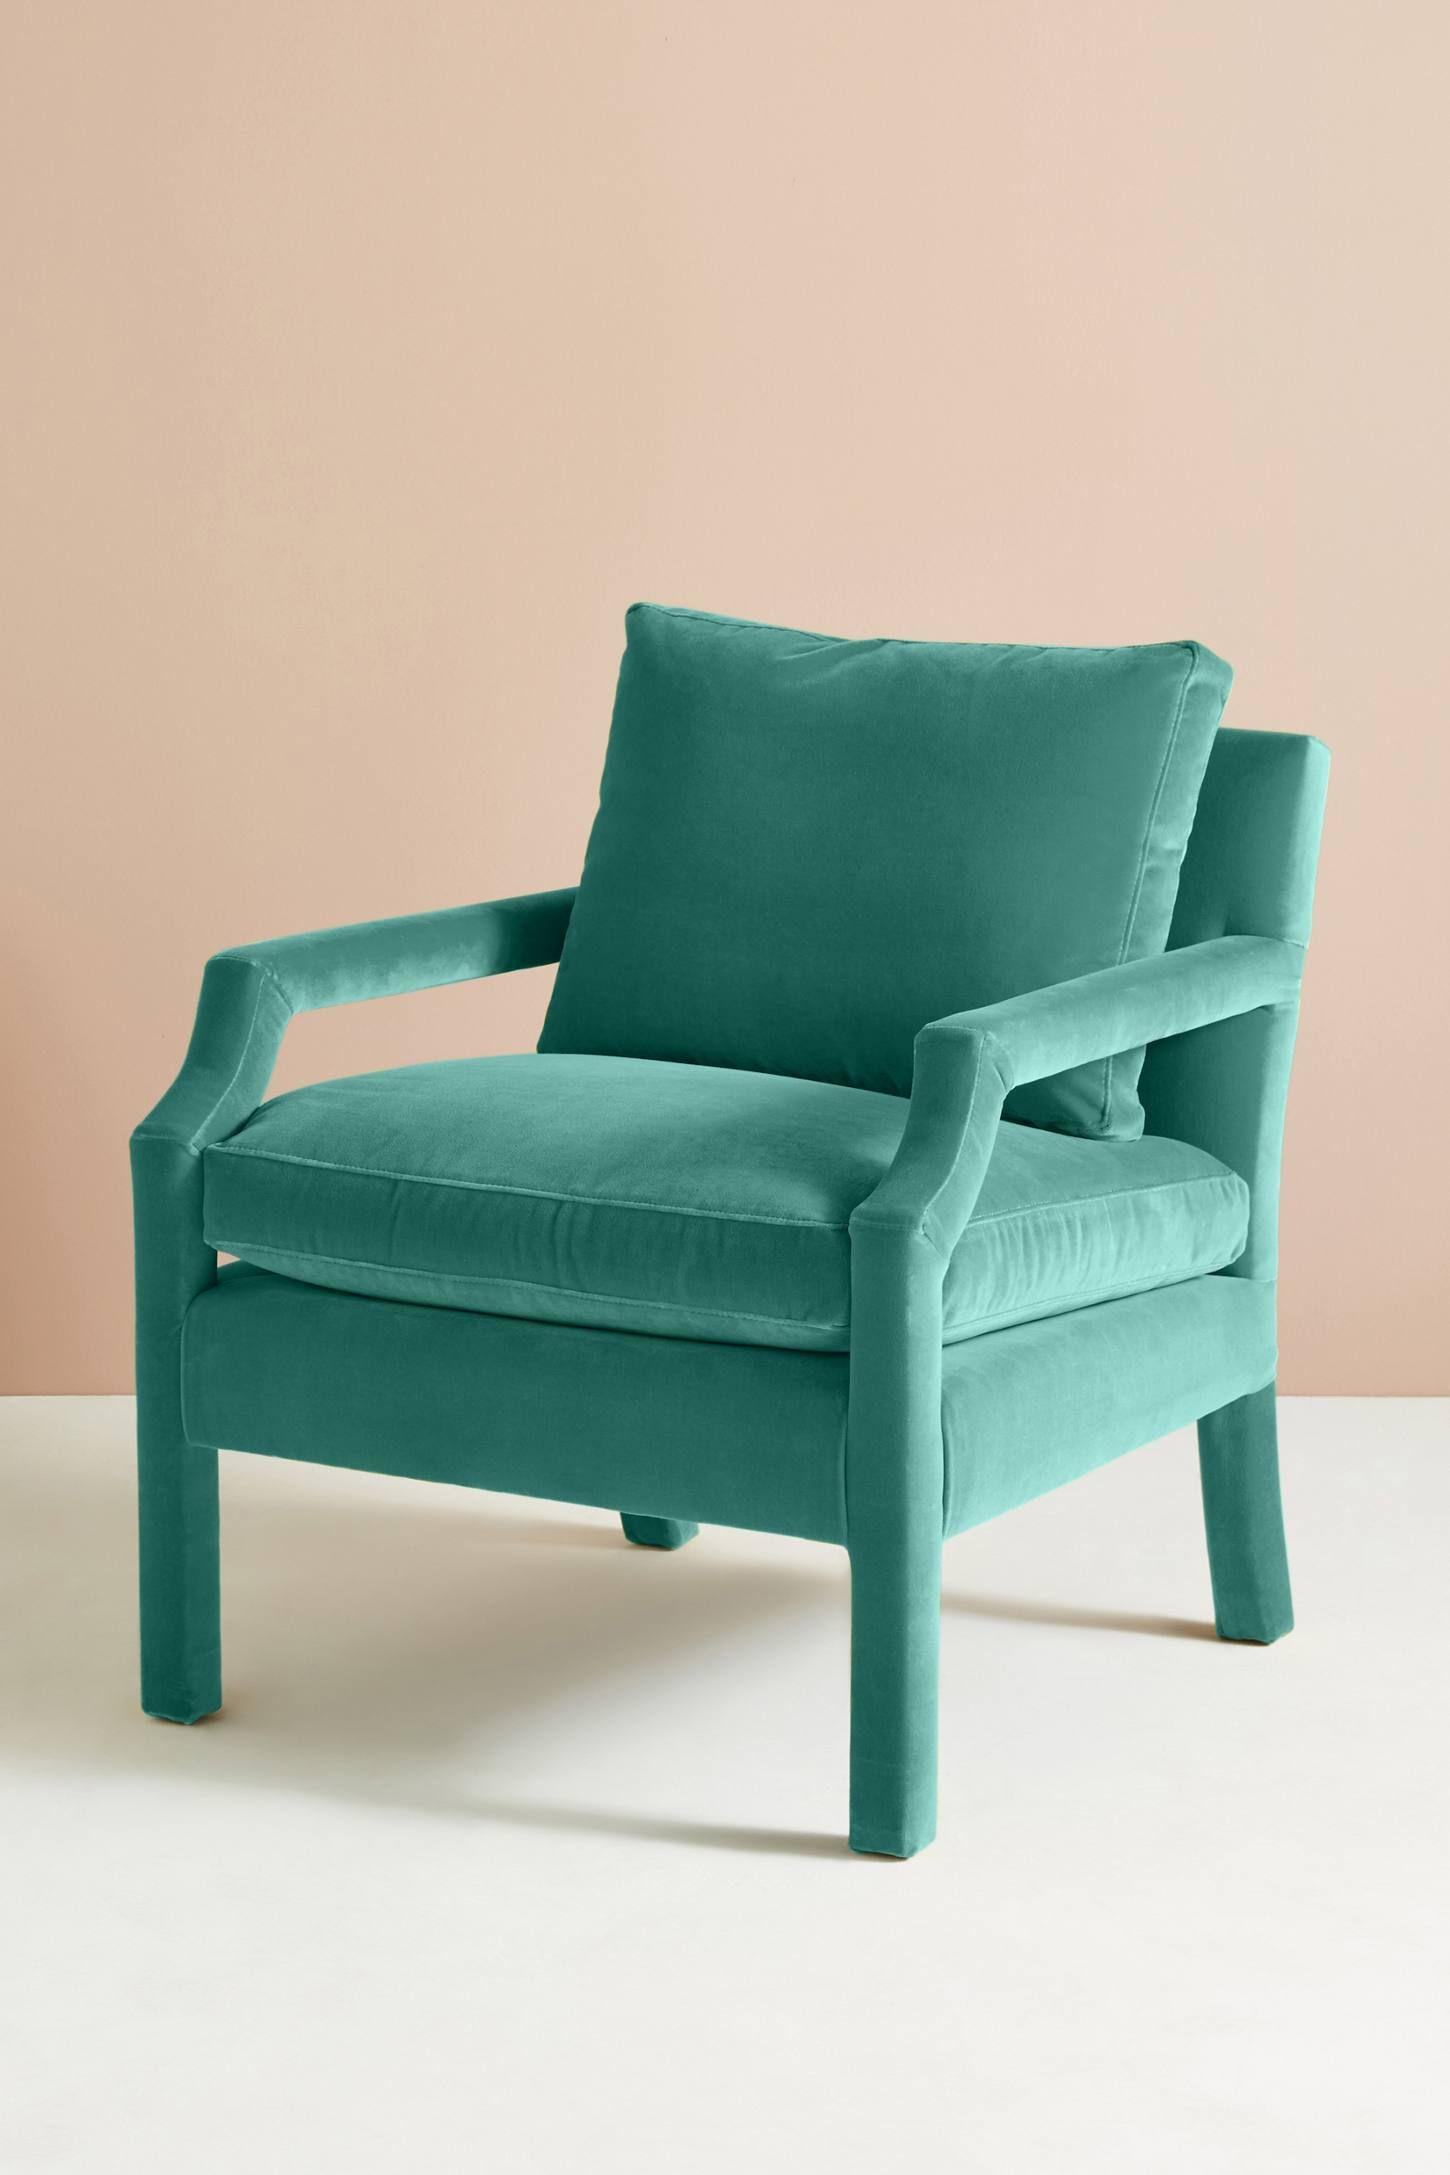 Prime Velvet Delaney Chair Furniture Fancies Furniture Creativecarmelina Interior Chair Design Creativecarmelinacom